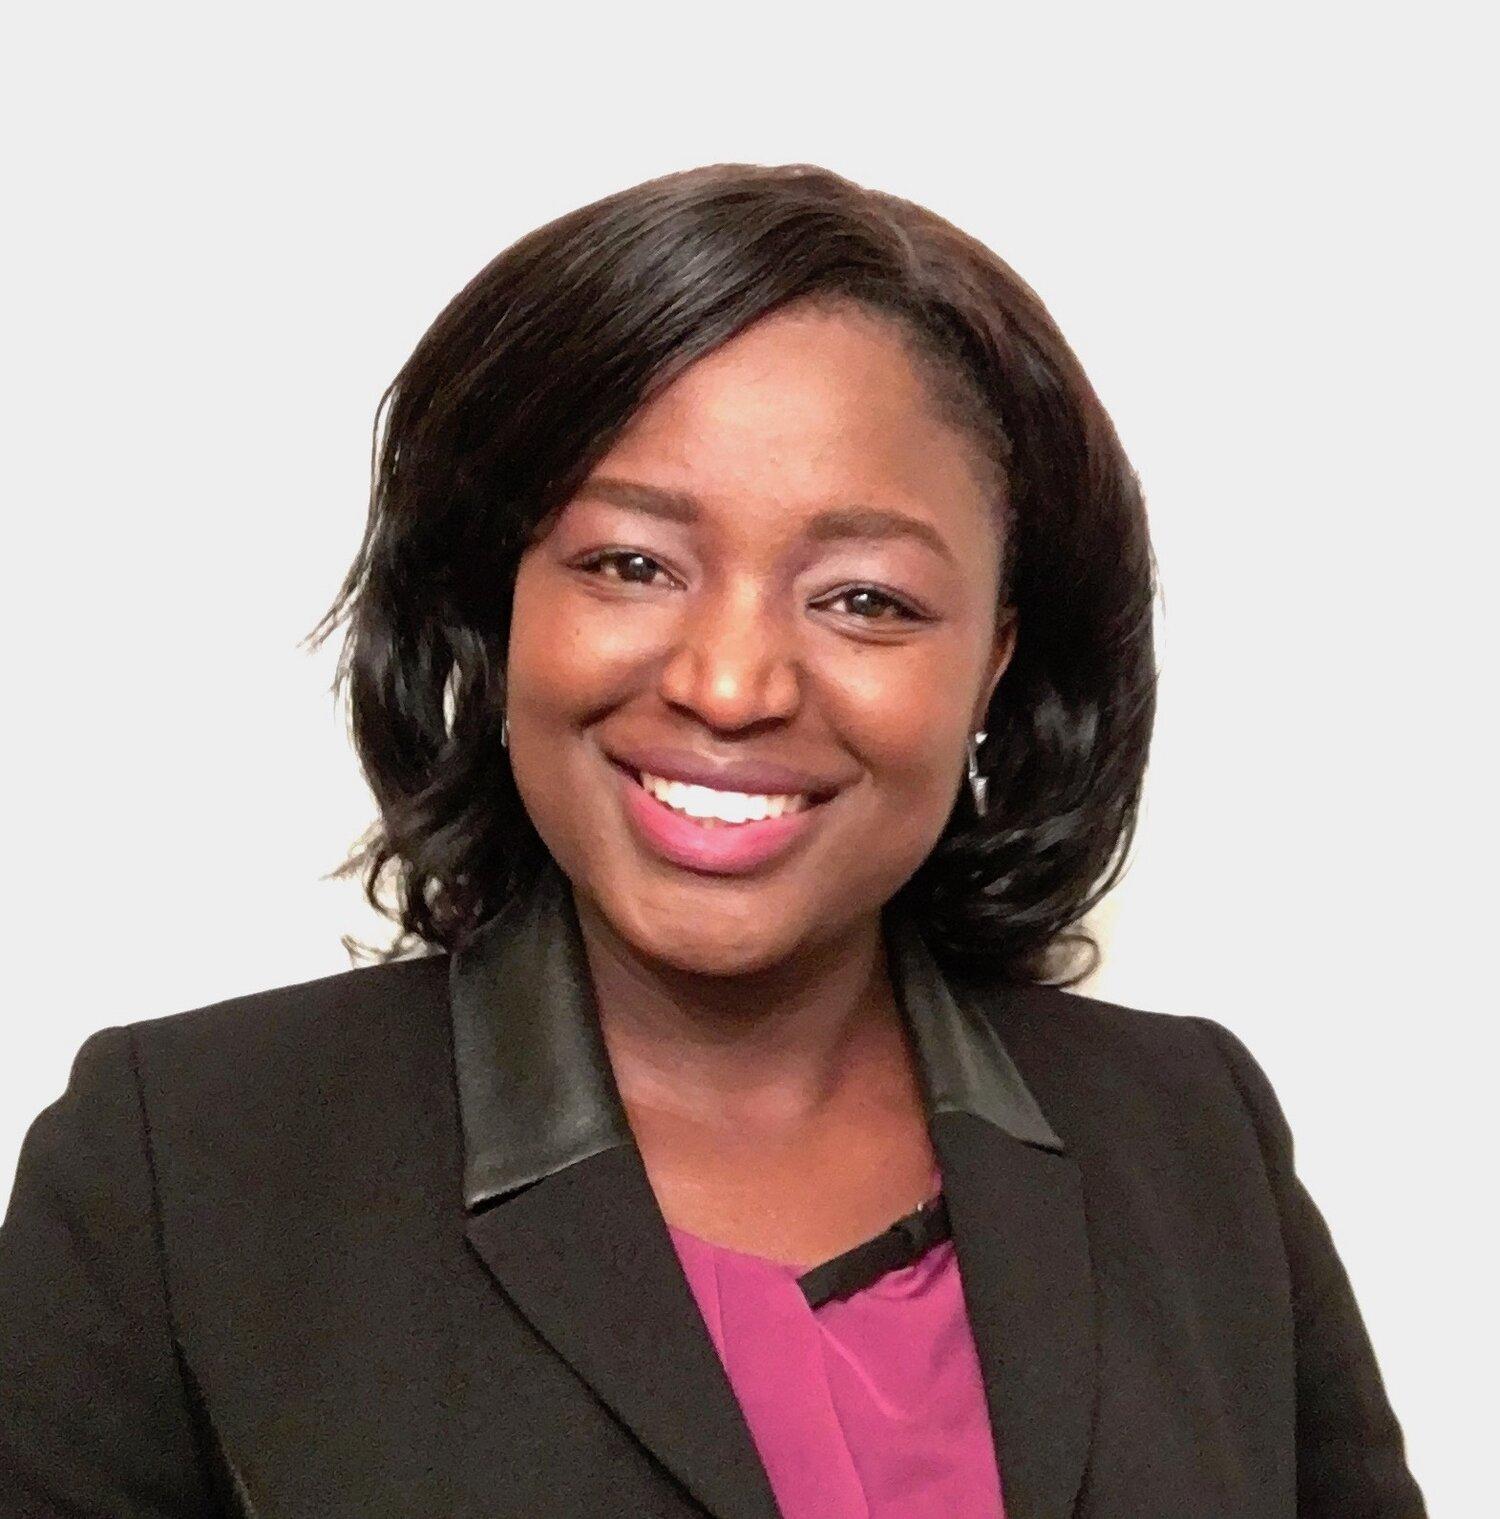 Sarah Asio, PhD ● Data Science Lead ● Johnson & Johnson